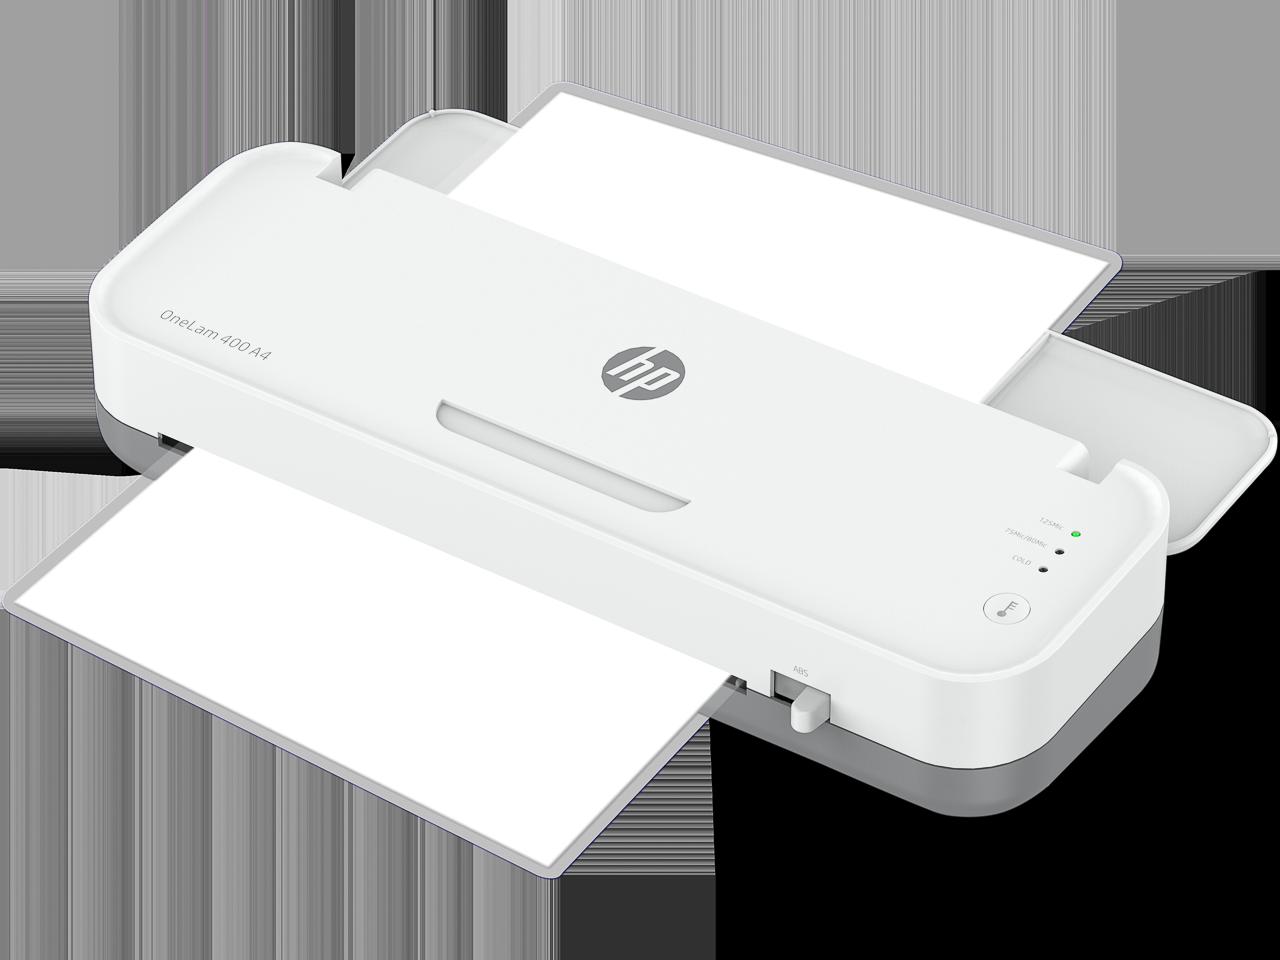 HP LAMINATOR ONELAM400 A4 3160 75-125µ white 1